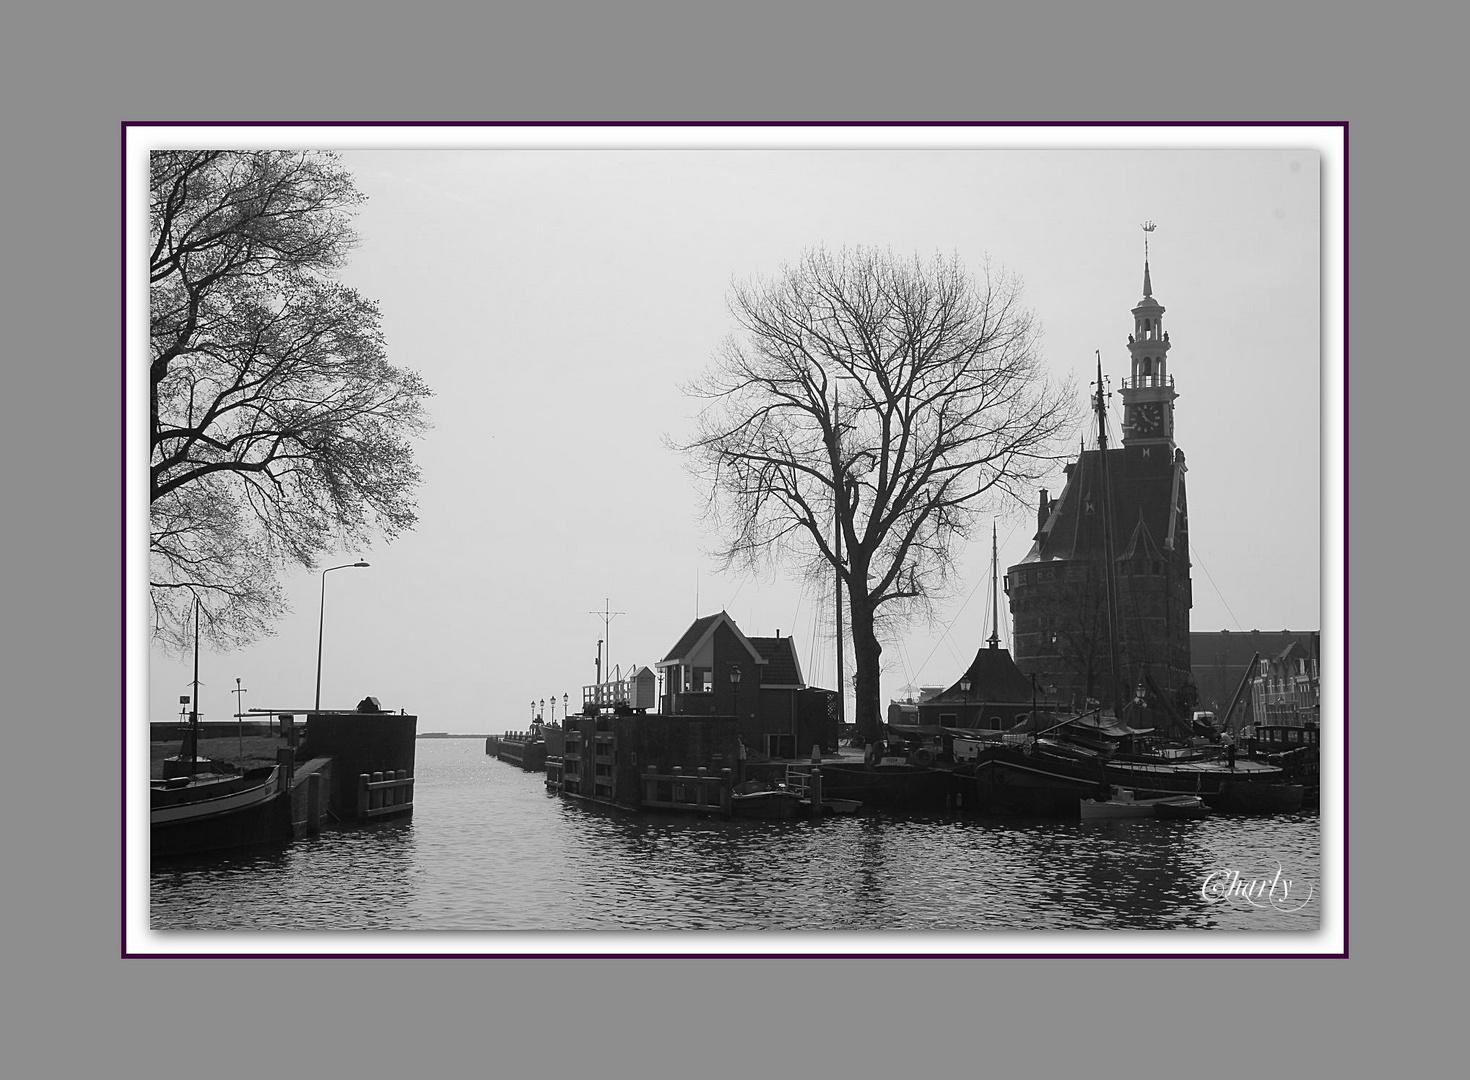 ............hoorn / marker meer / holland..........